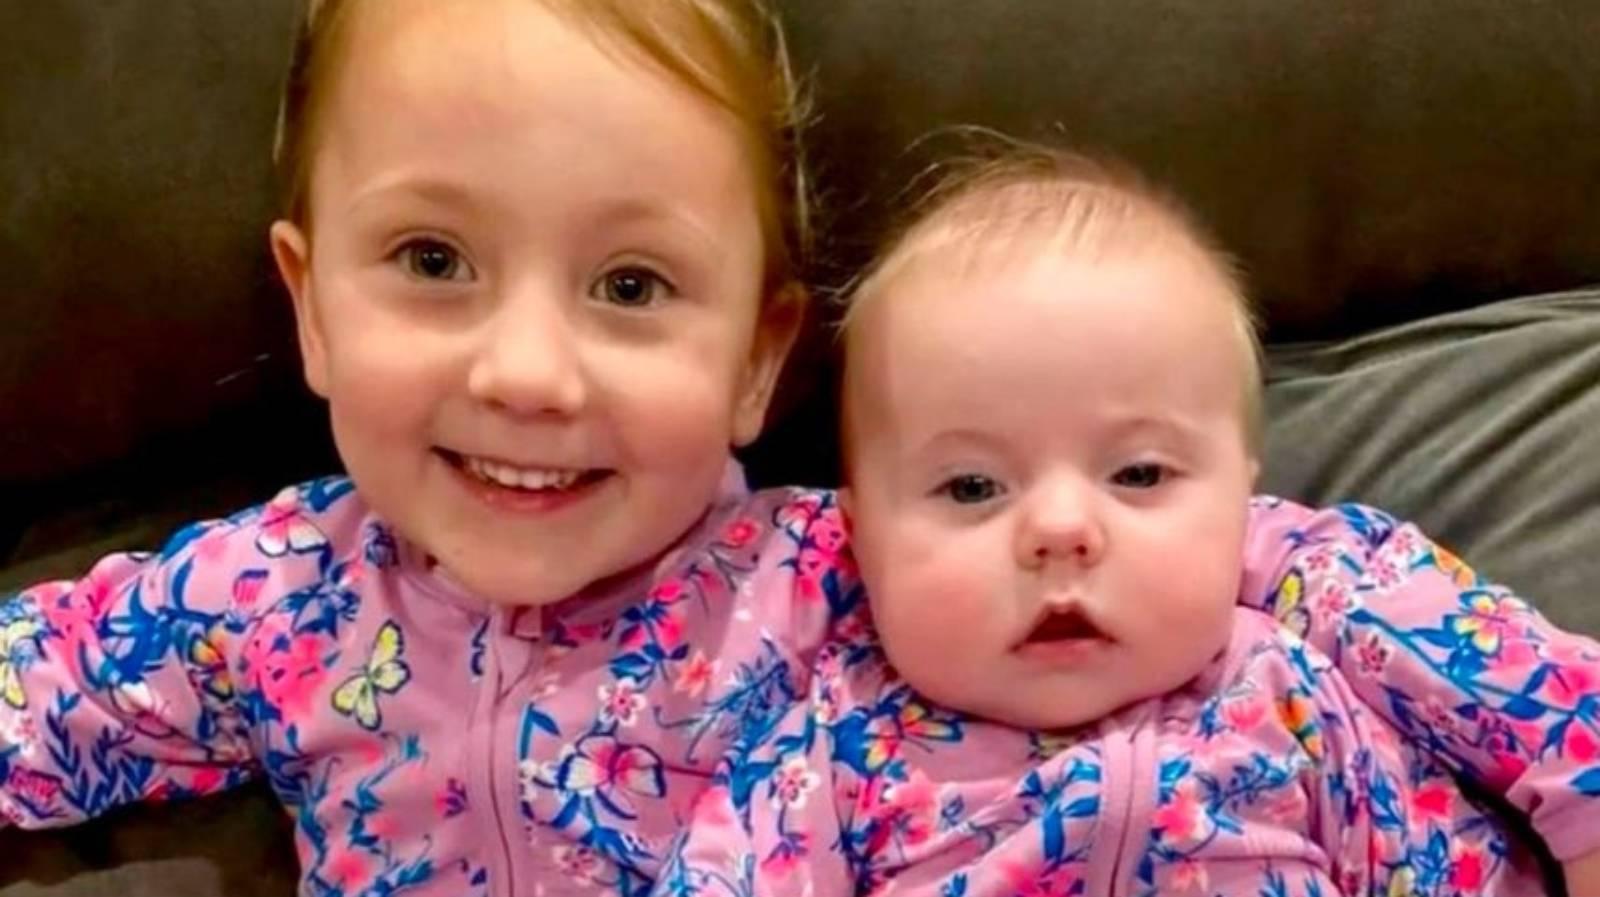 Parents of missing Australian girl Cleo Smith make emotional plea